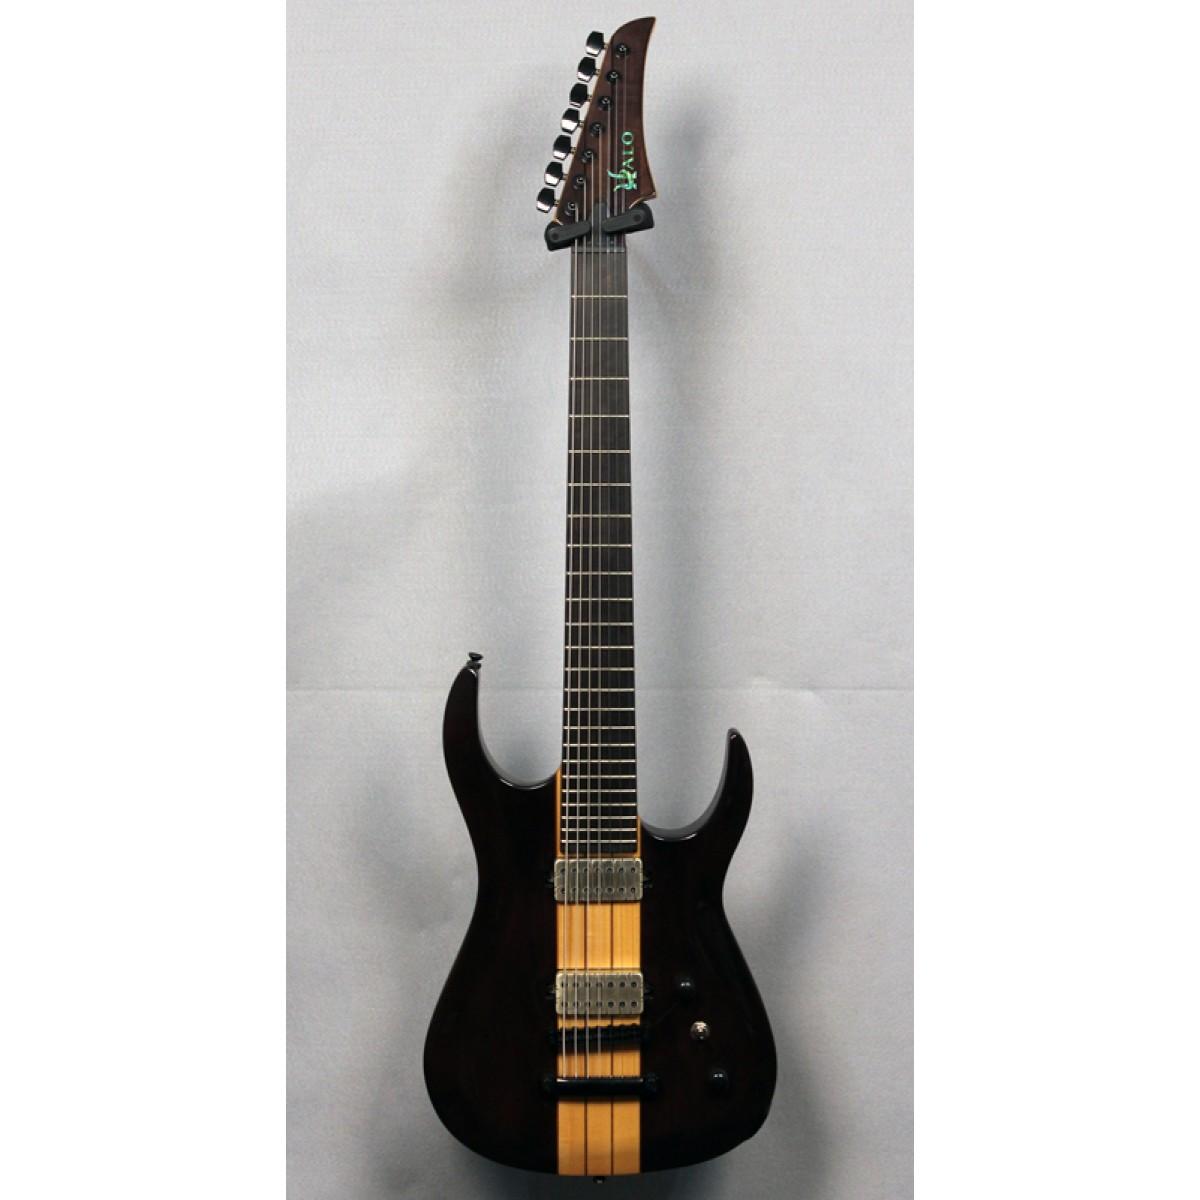 halo guitars merus 7 string 27 scale tune o matic. Black Bedroom Furniture Sets. Home Design Ideas